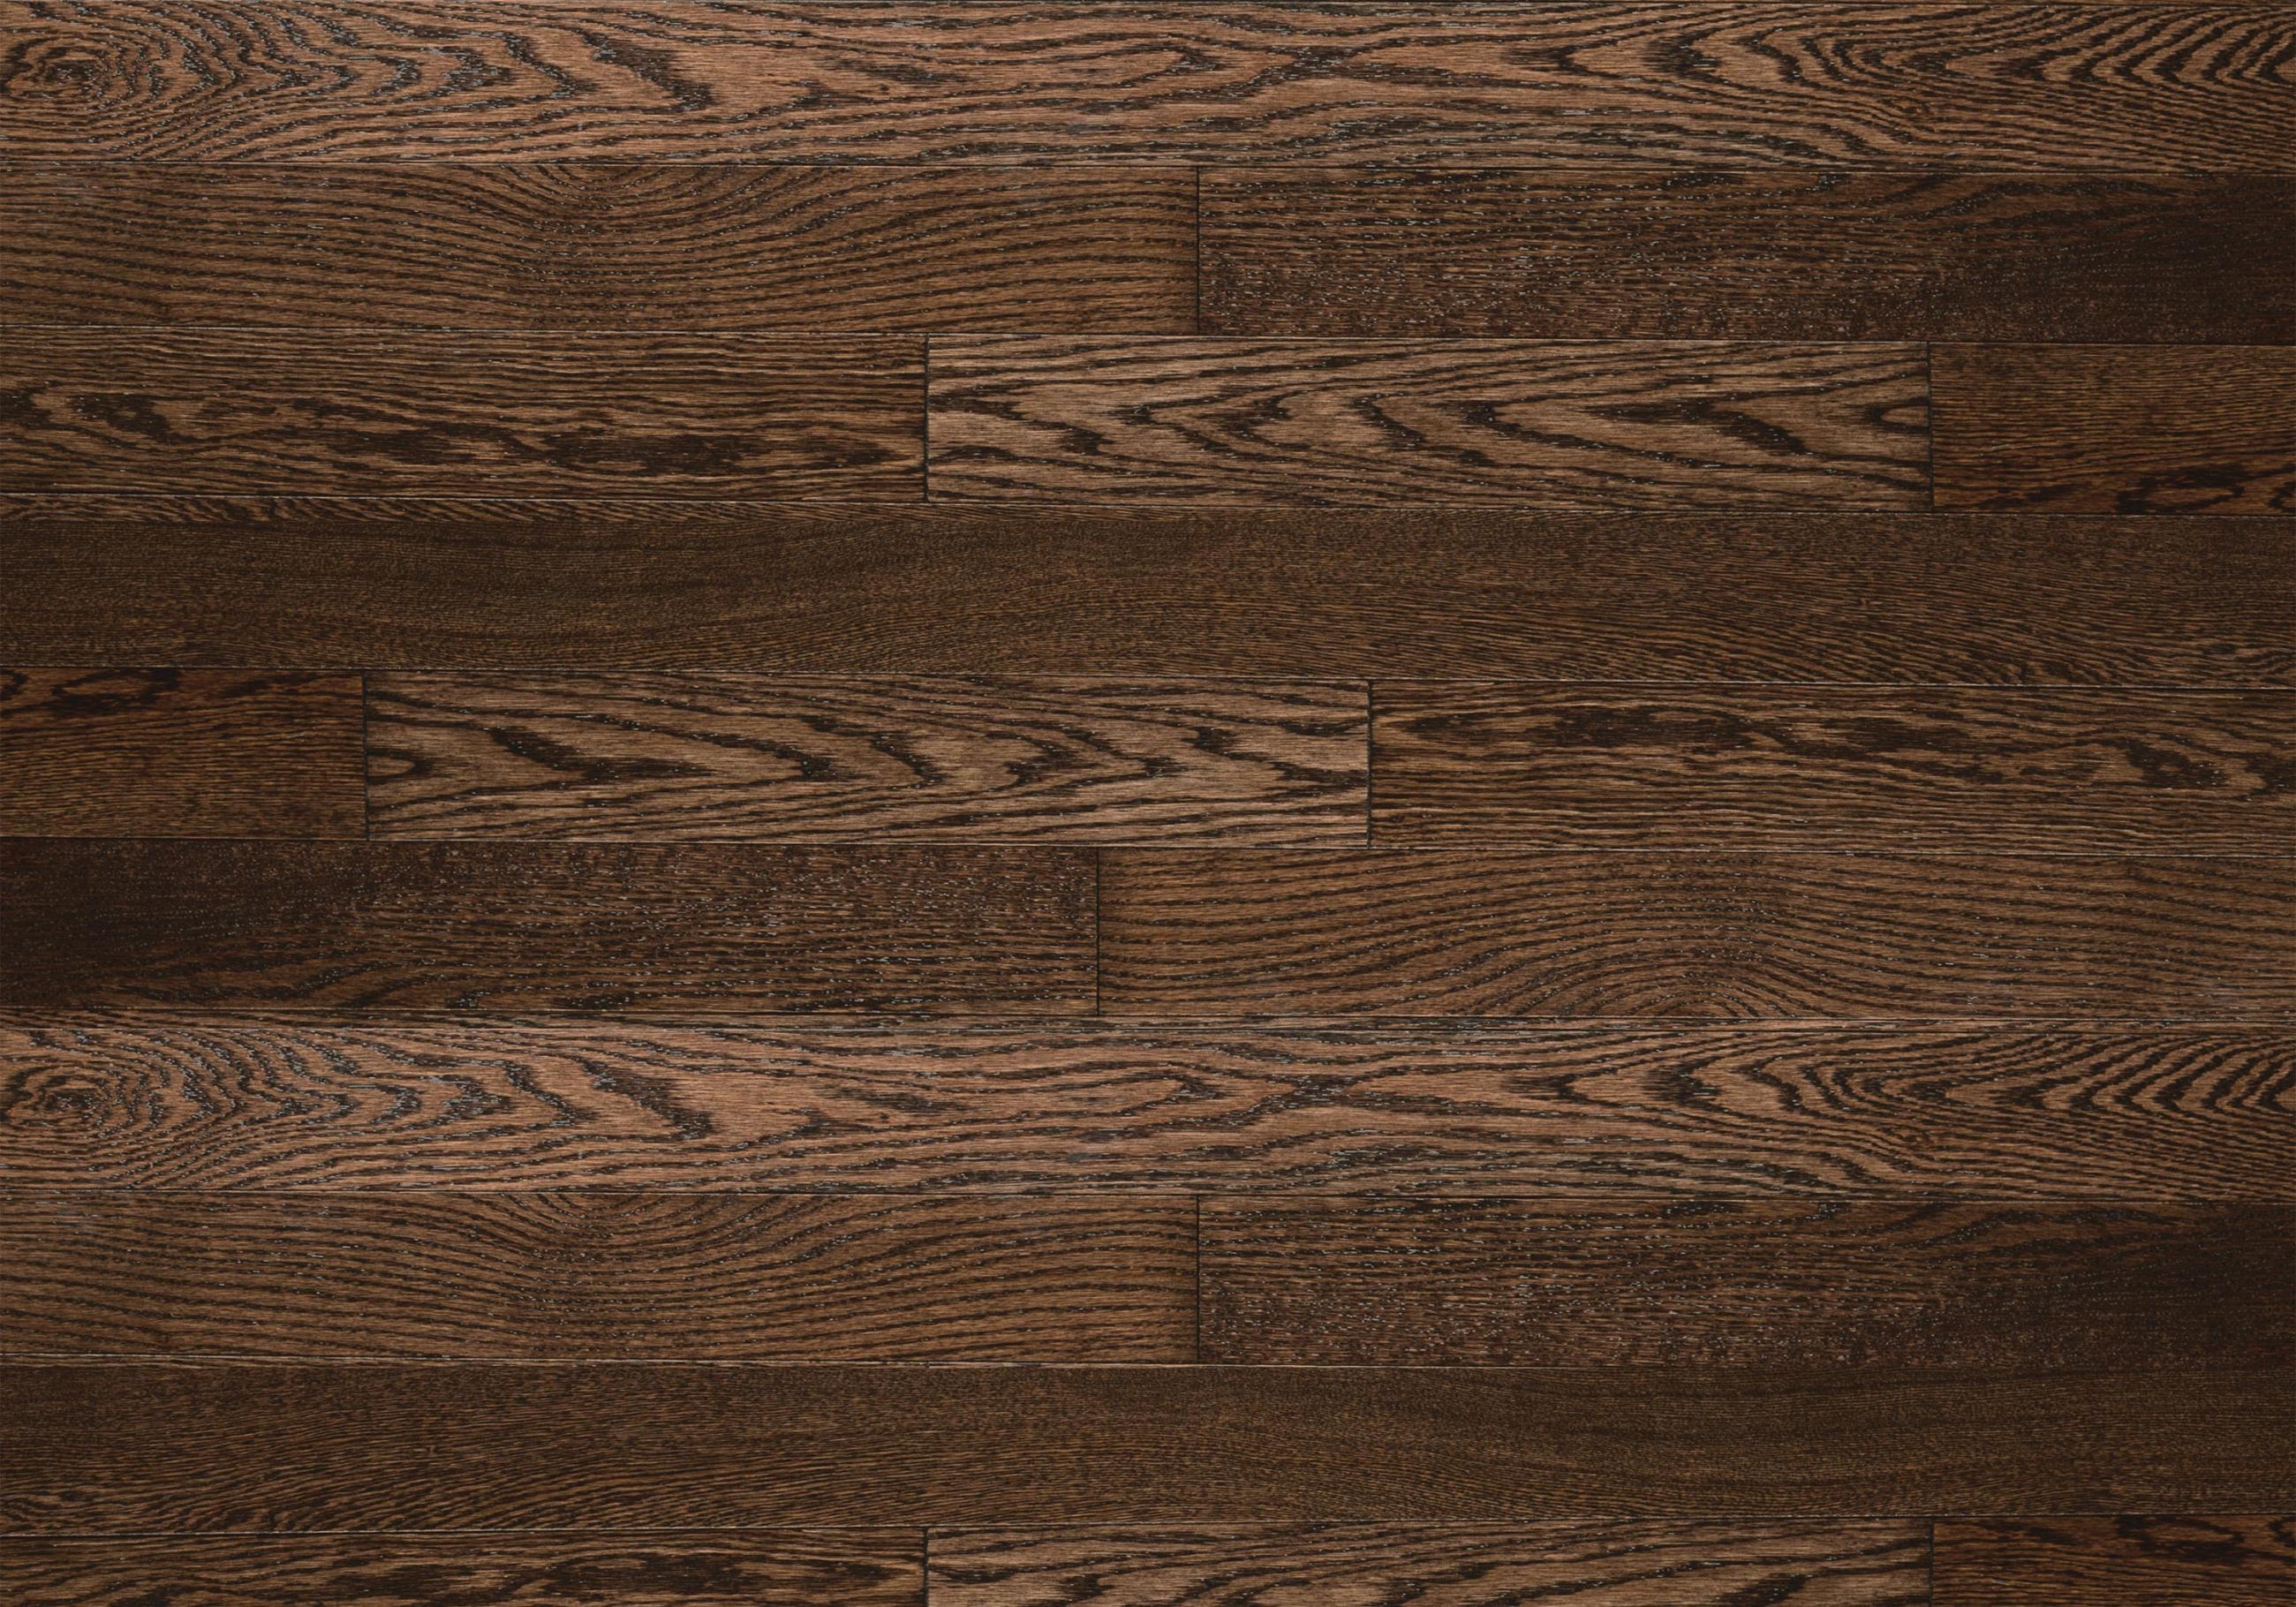 Lauzon Essential Red Oak Chocolate Aa Floors Amp More Ltd